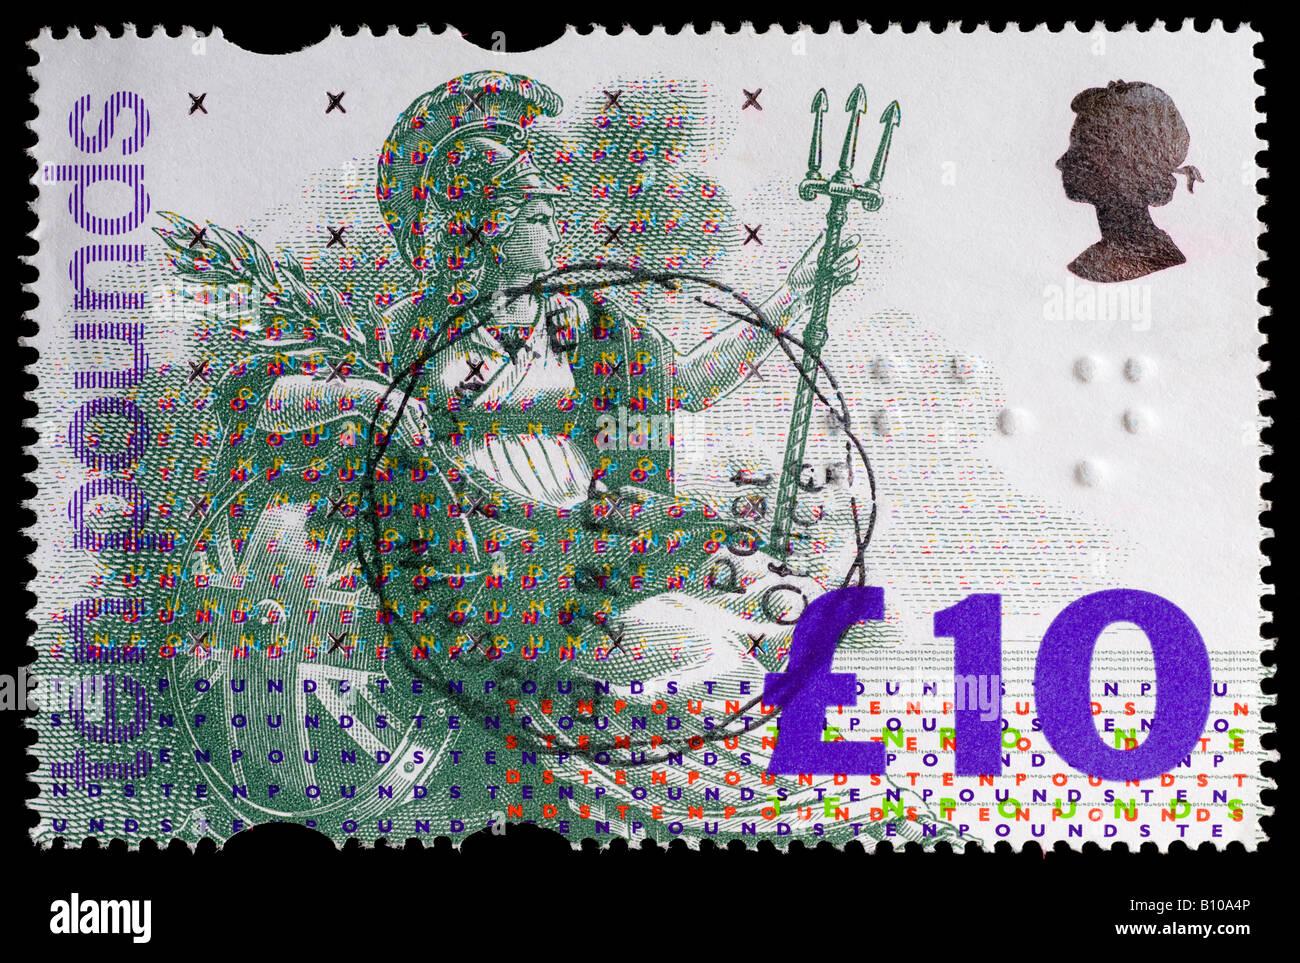 "Usa 1993 Gran Bretaña £10 Britannia de ""alto valor"" sello - primer sello británico con grabado de inscripciones en BRAILLE. Foto de stock"